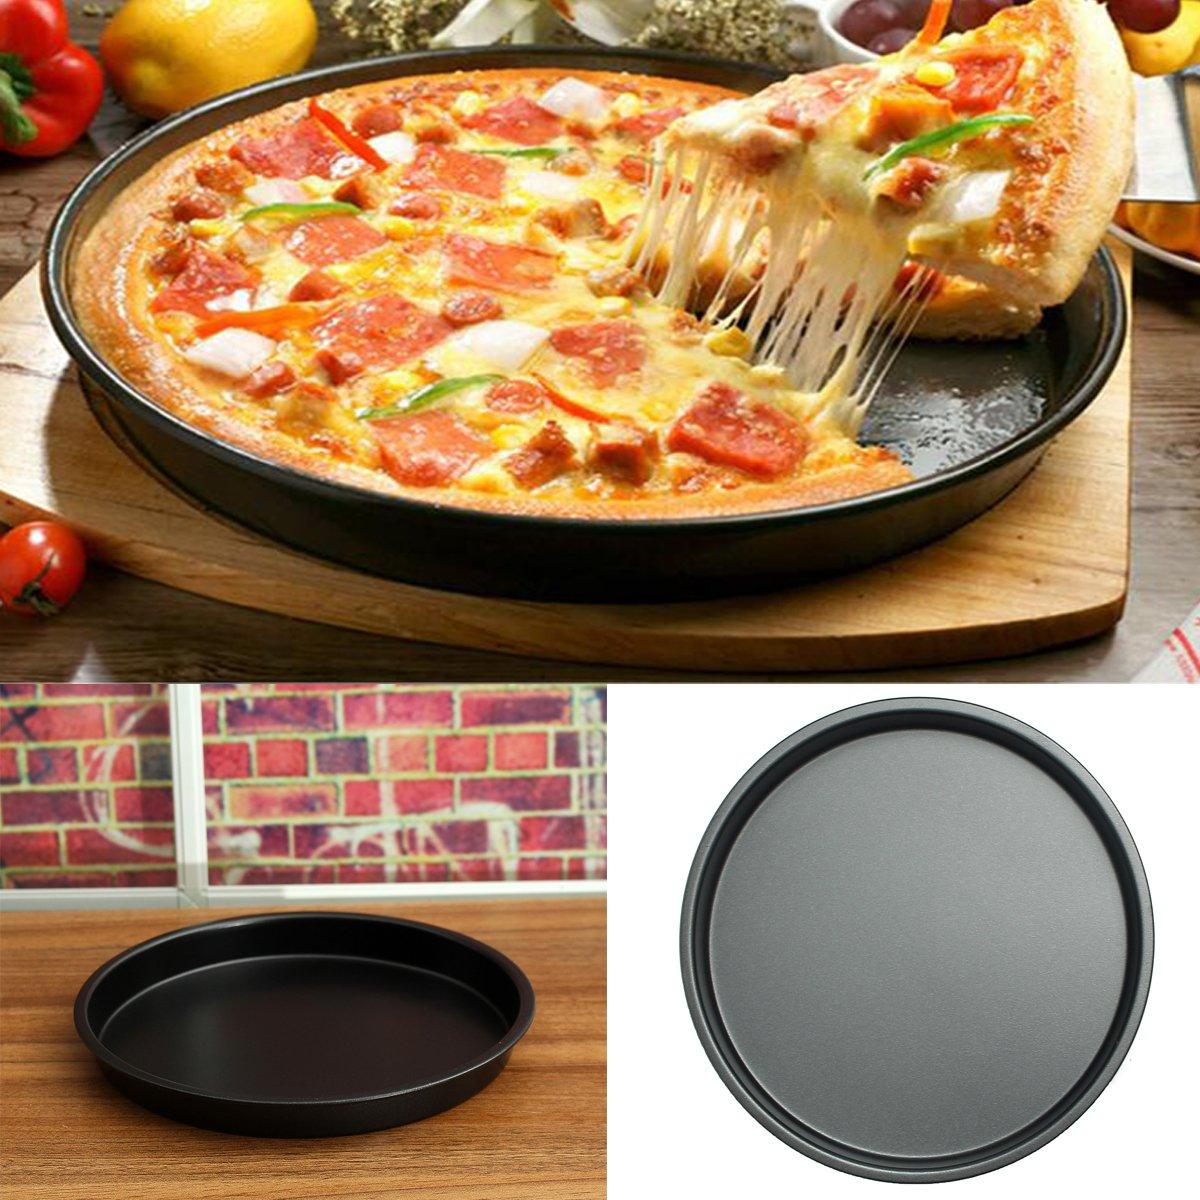 Janolia Plato para Pizza, Revestimiento Antiadherente de Acero ...